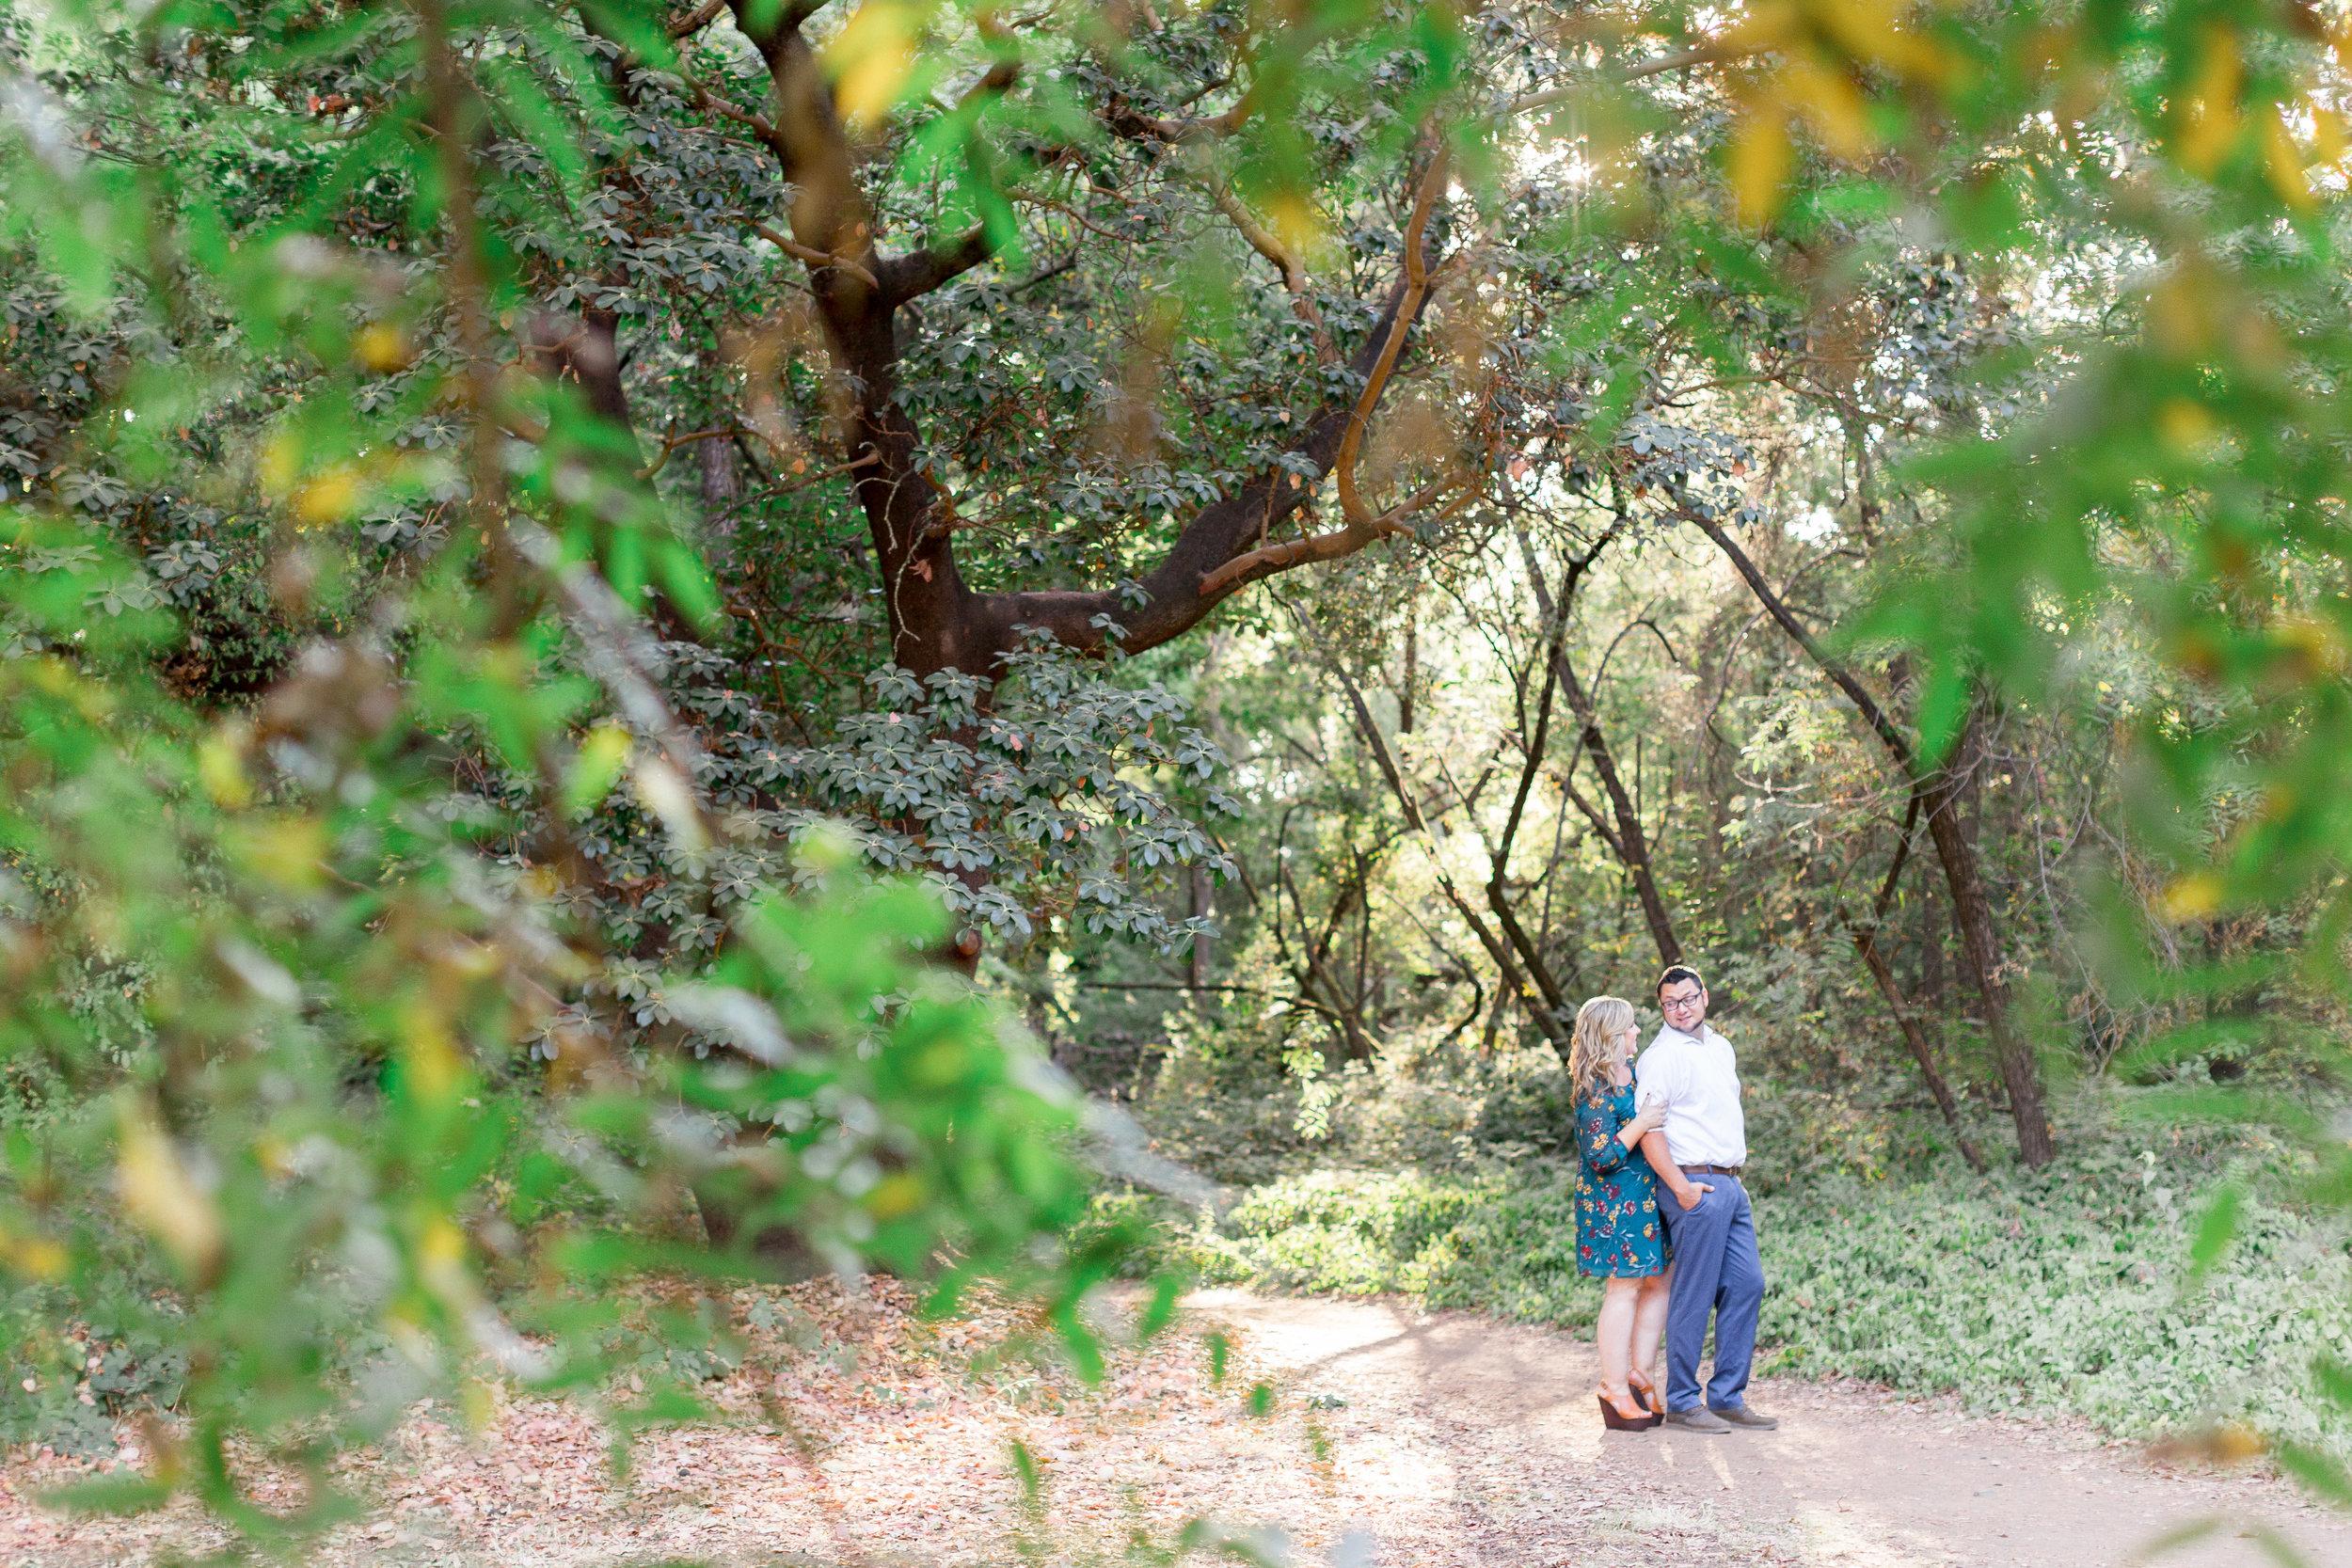 96Lower-Bidwell-Park-Chico-Engagement-photos (17 of).jpg